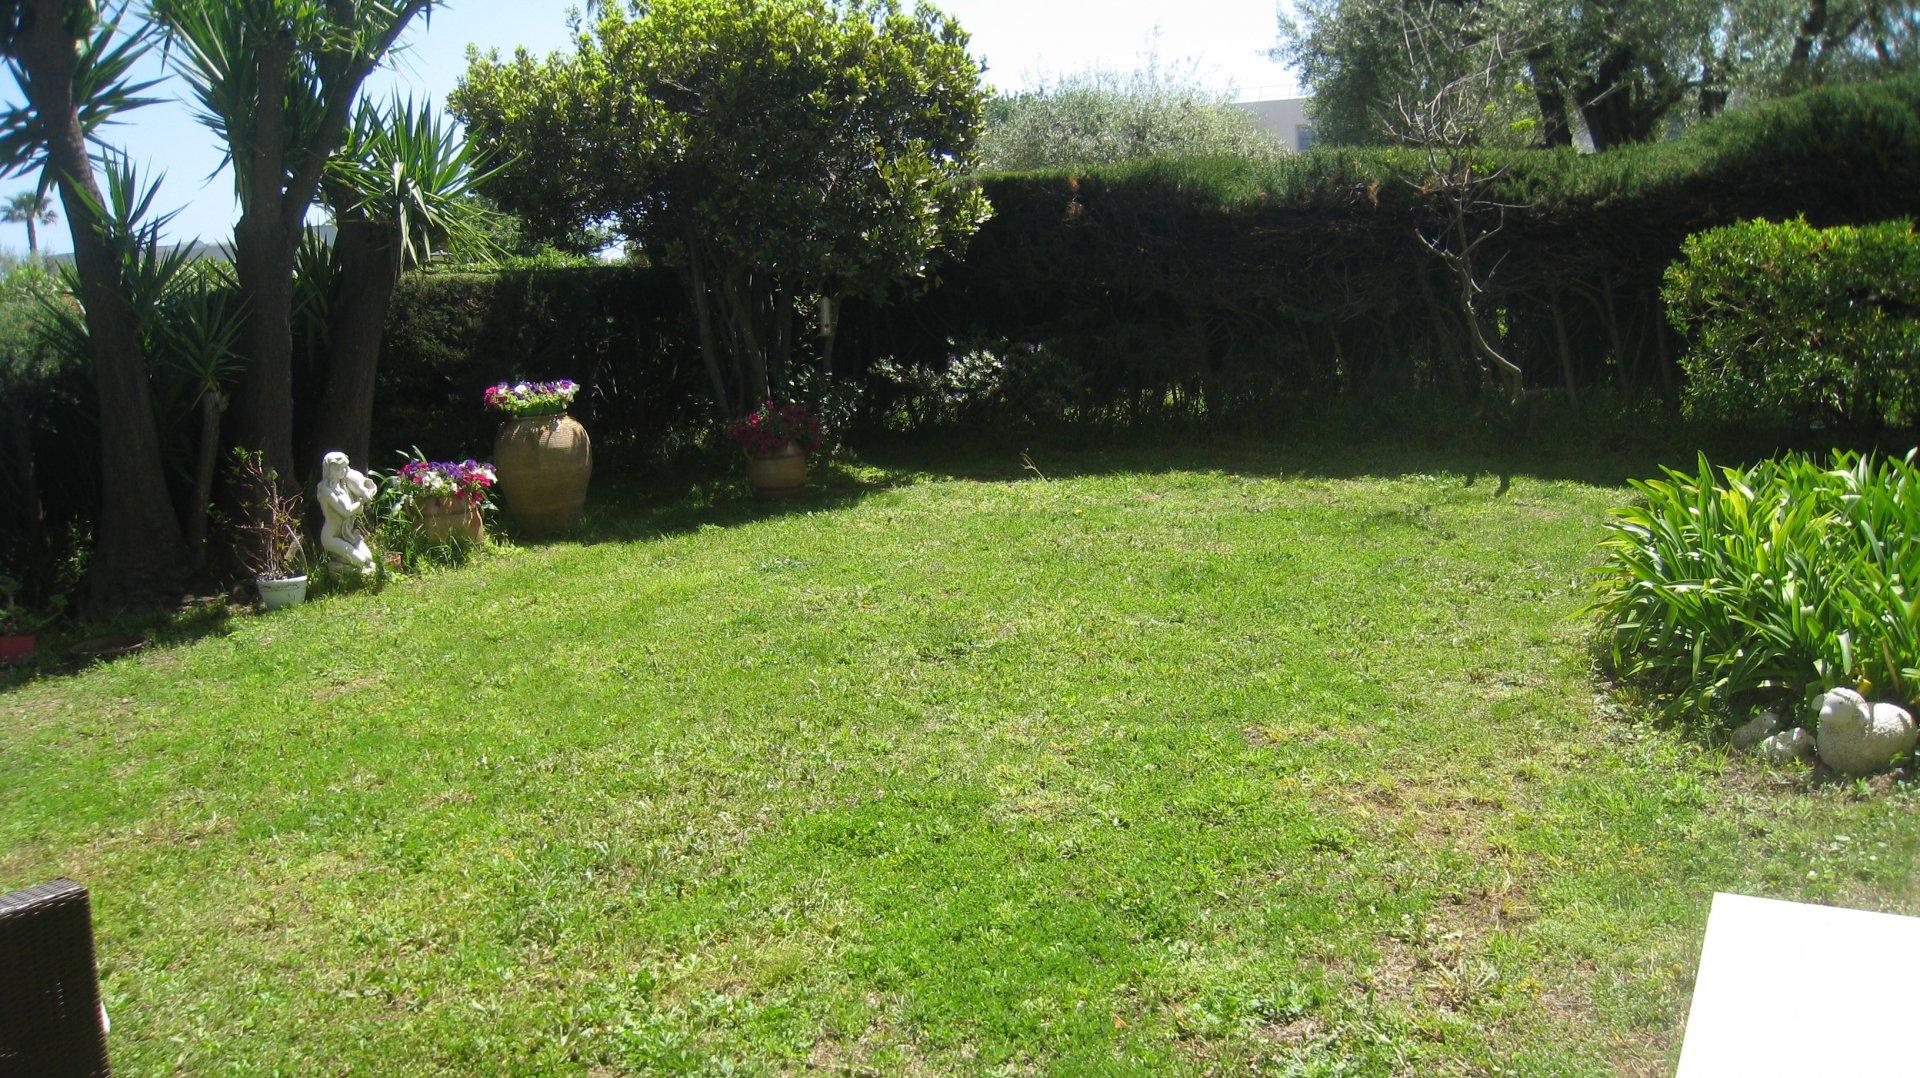 Côte d'Azur, Antibes, appartement F4 avec jardin 200 m² , garage, piscine.